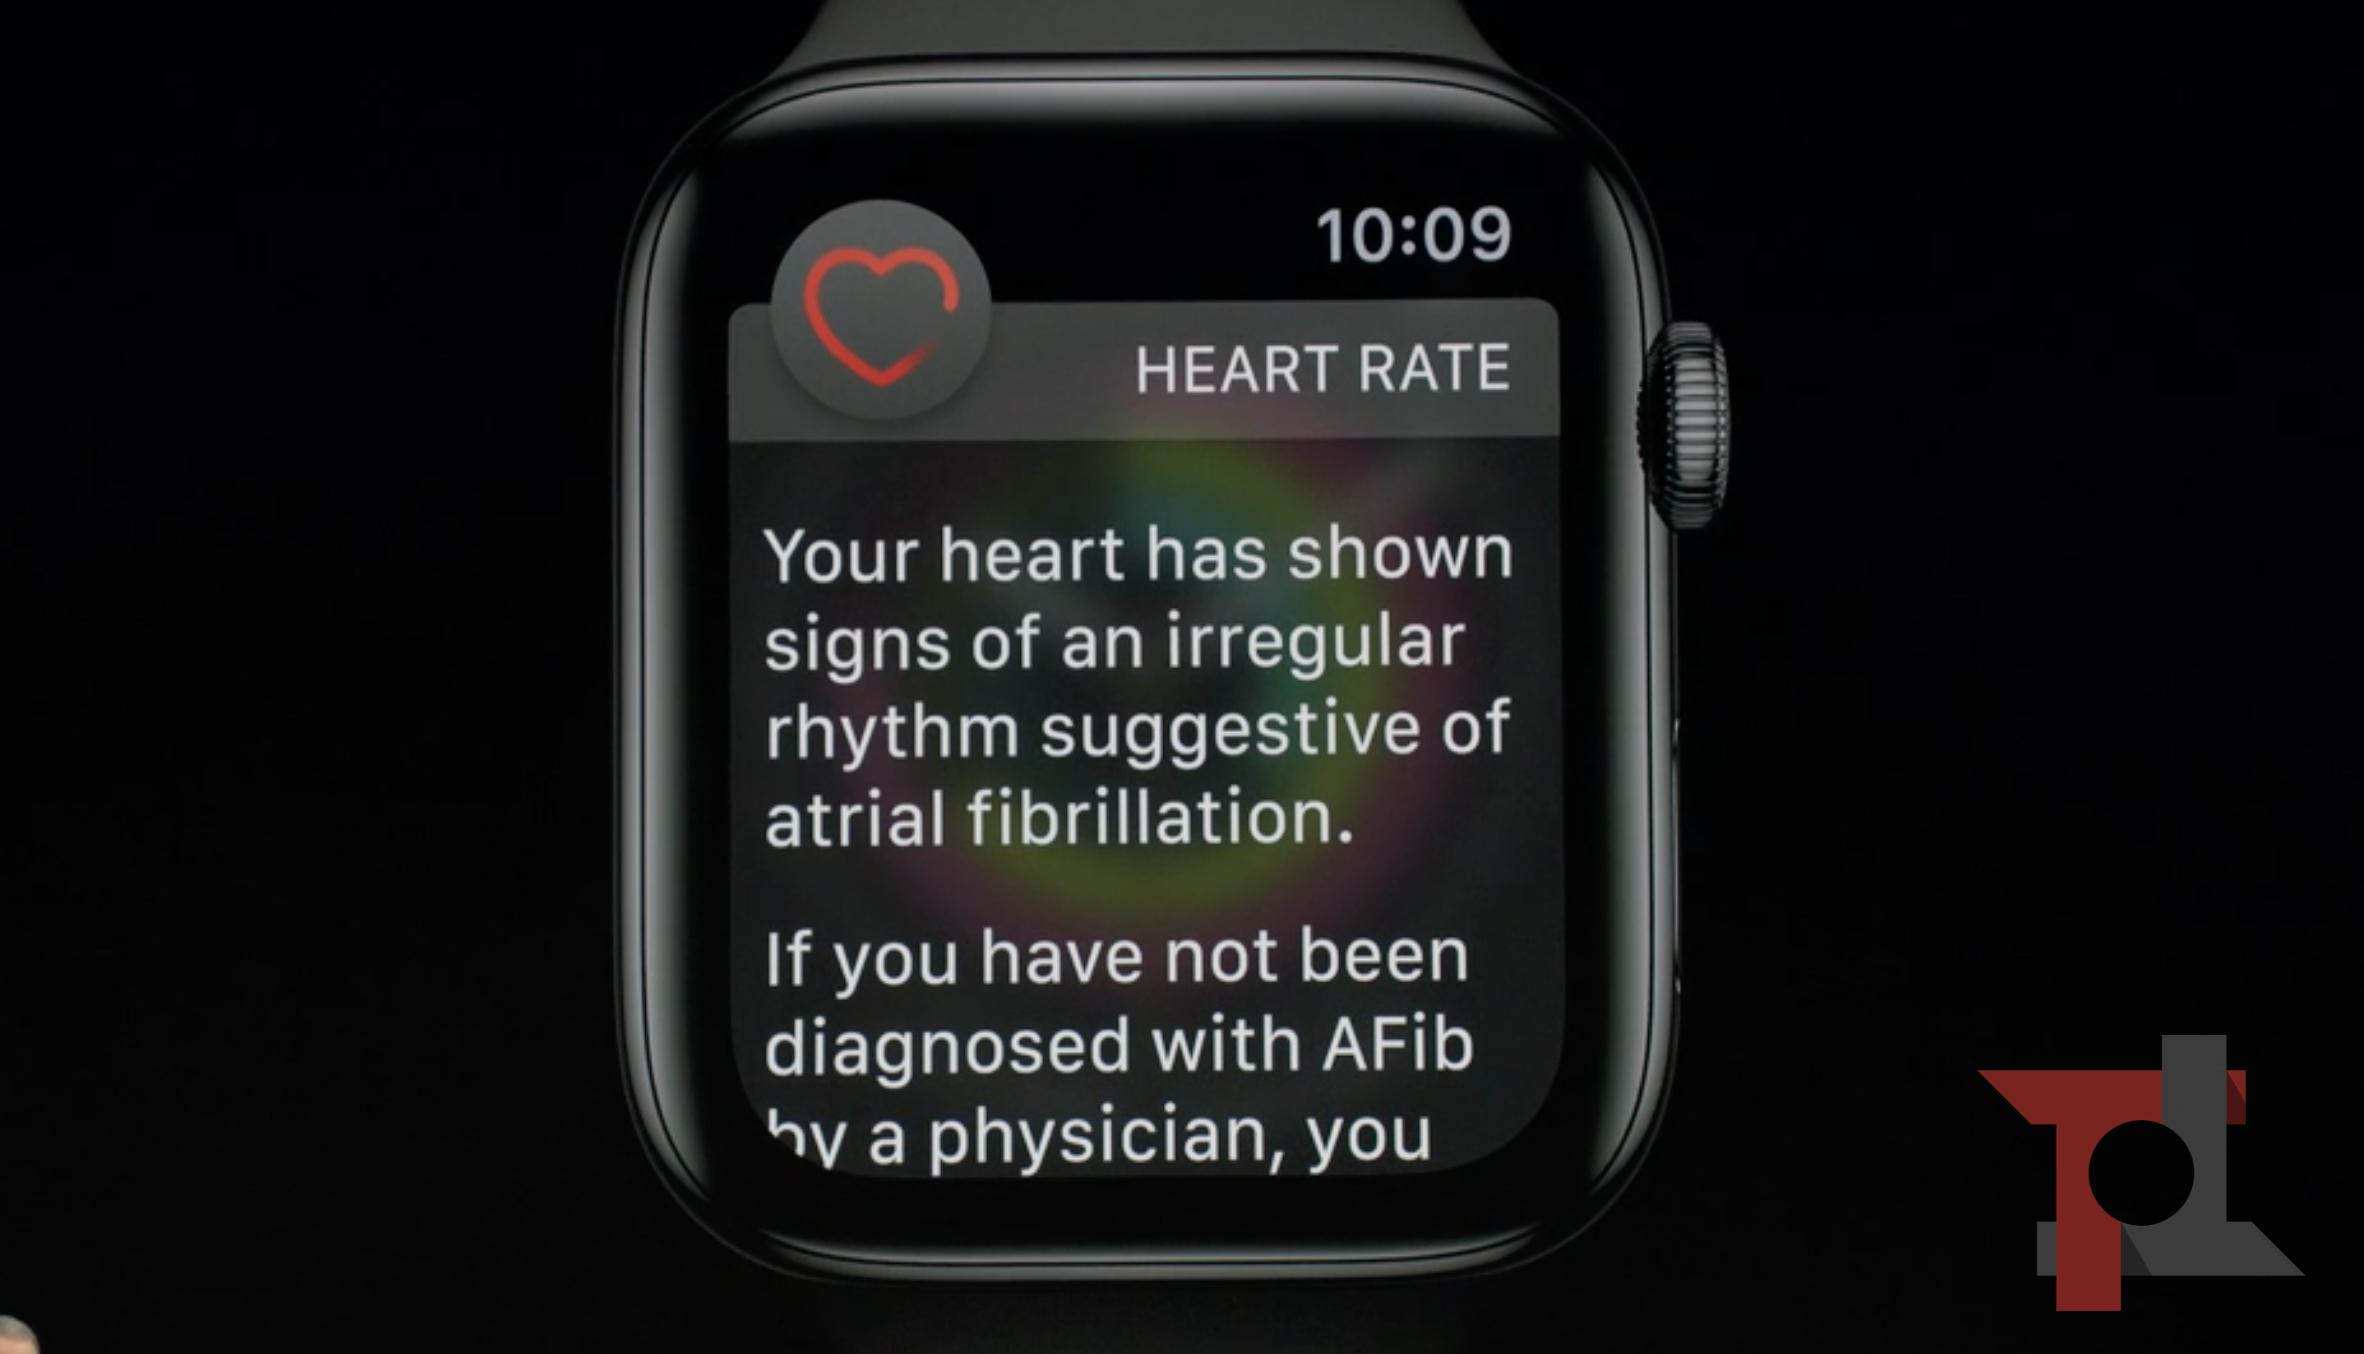 Apple Watch Series 4 ufficiali: eleganti e ricchi di funzioni, ovviamente costosi 3